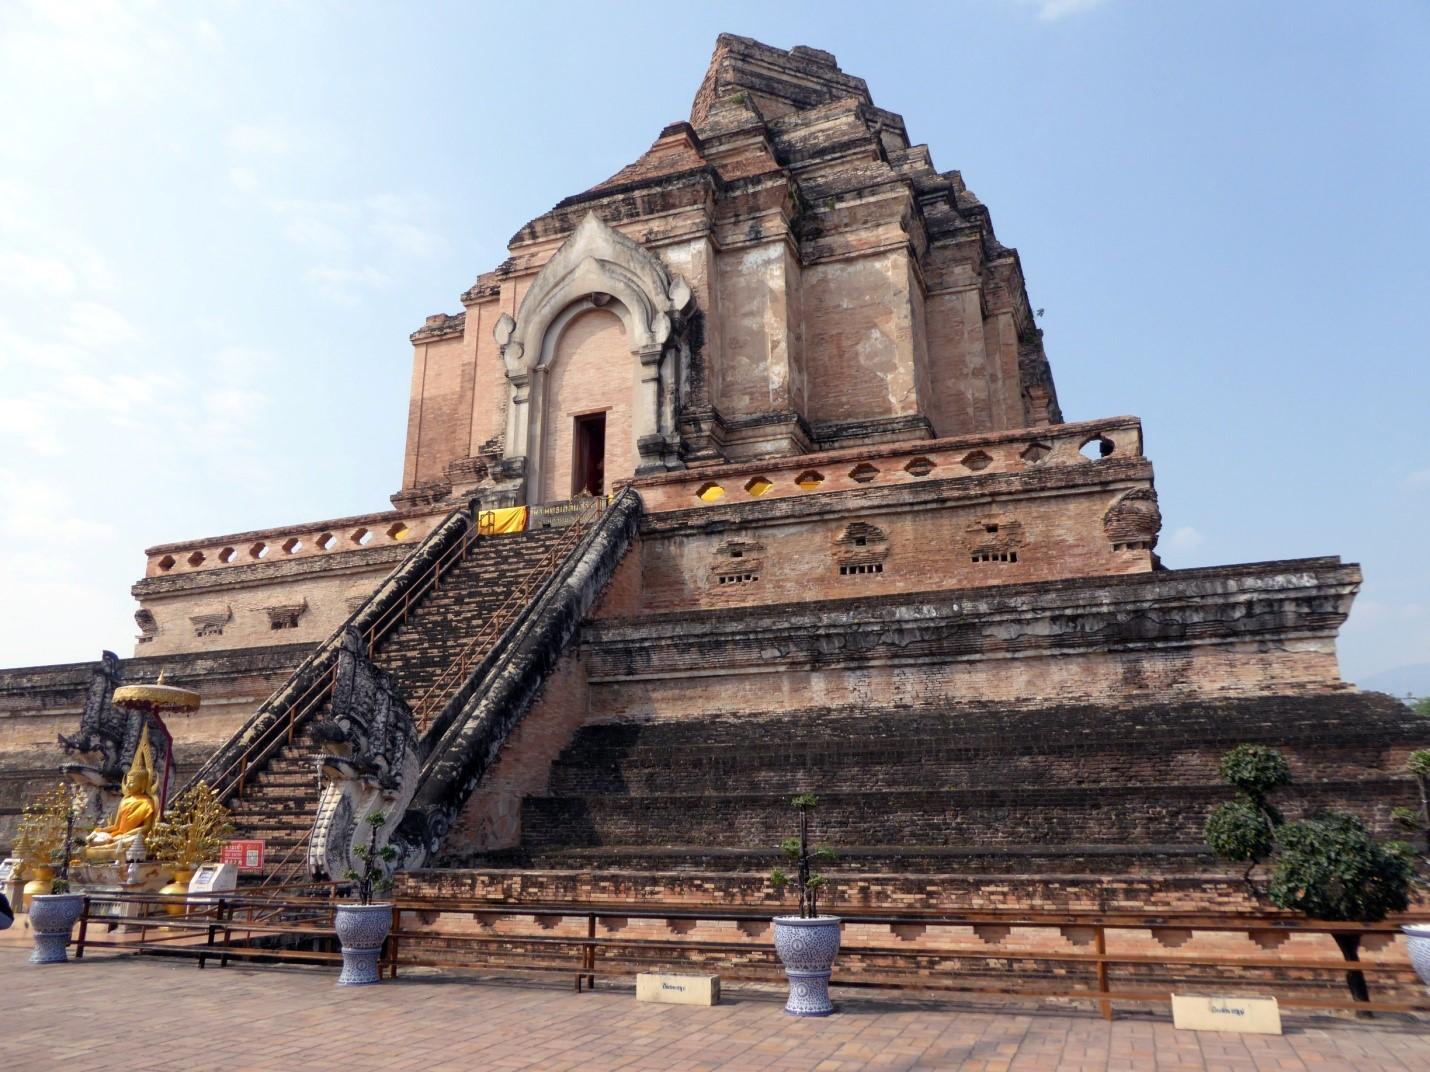 pic2_柴迪隆寺堪稱清邁城內第一大寺。寺內的大佛塔據說原先高80-90米。這是塔的基座.jpg